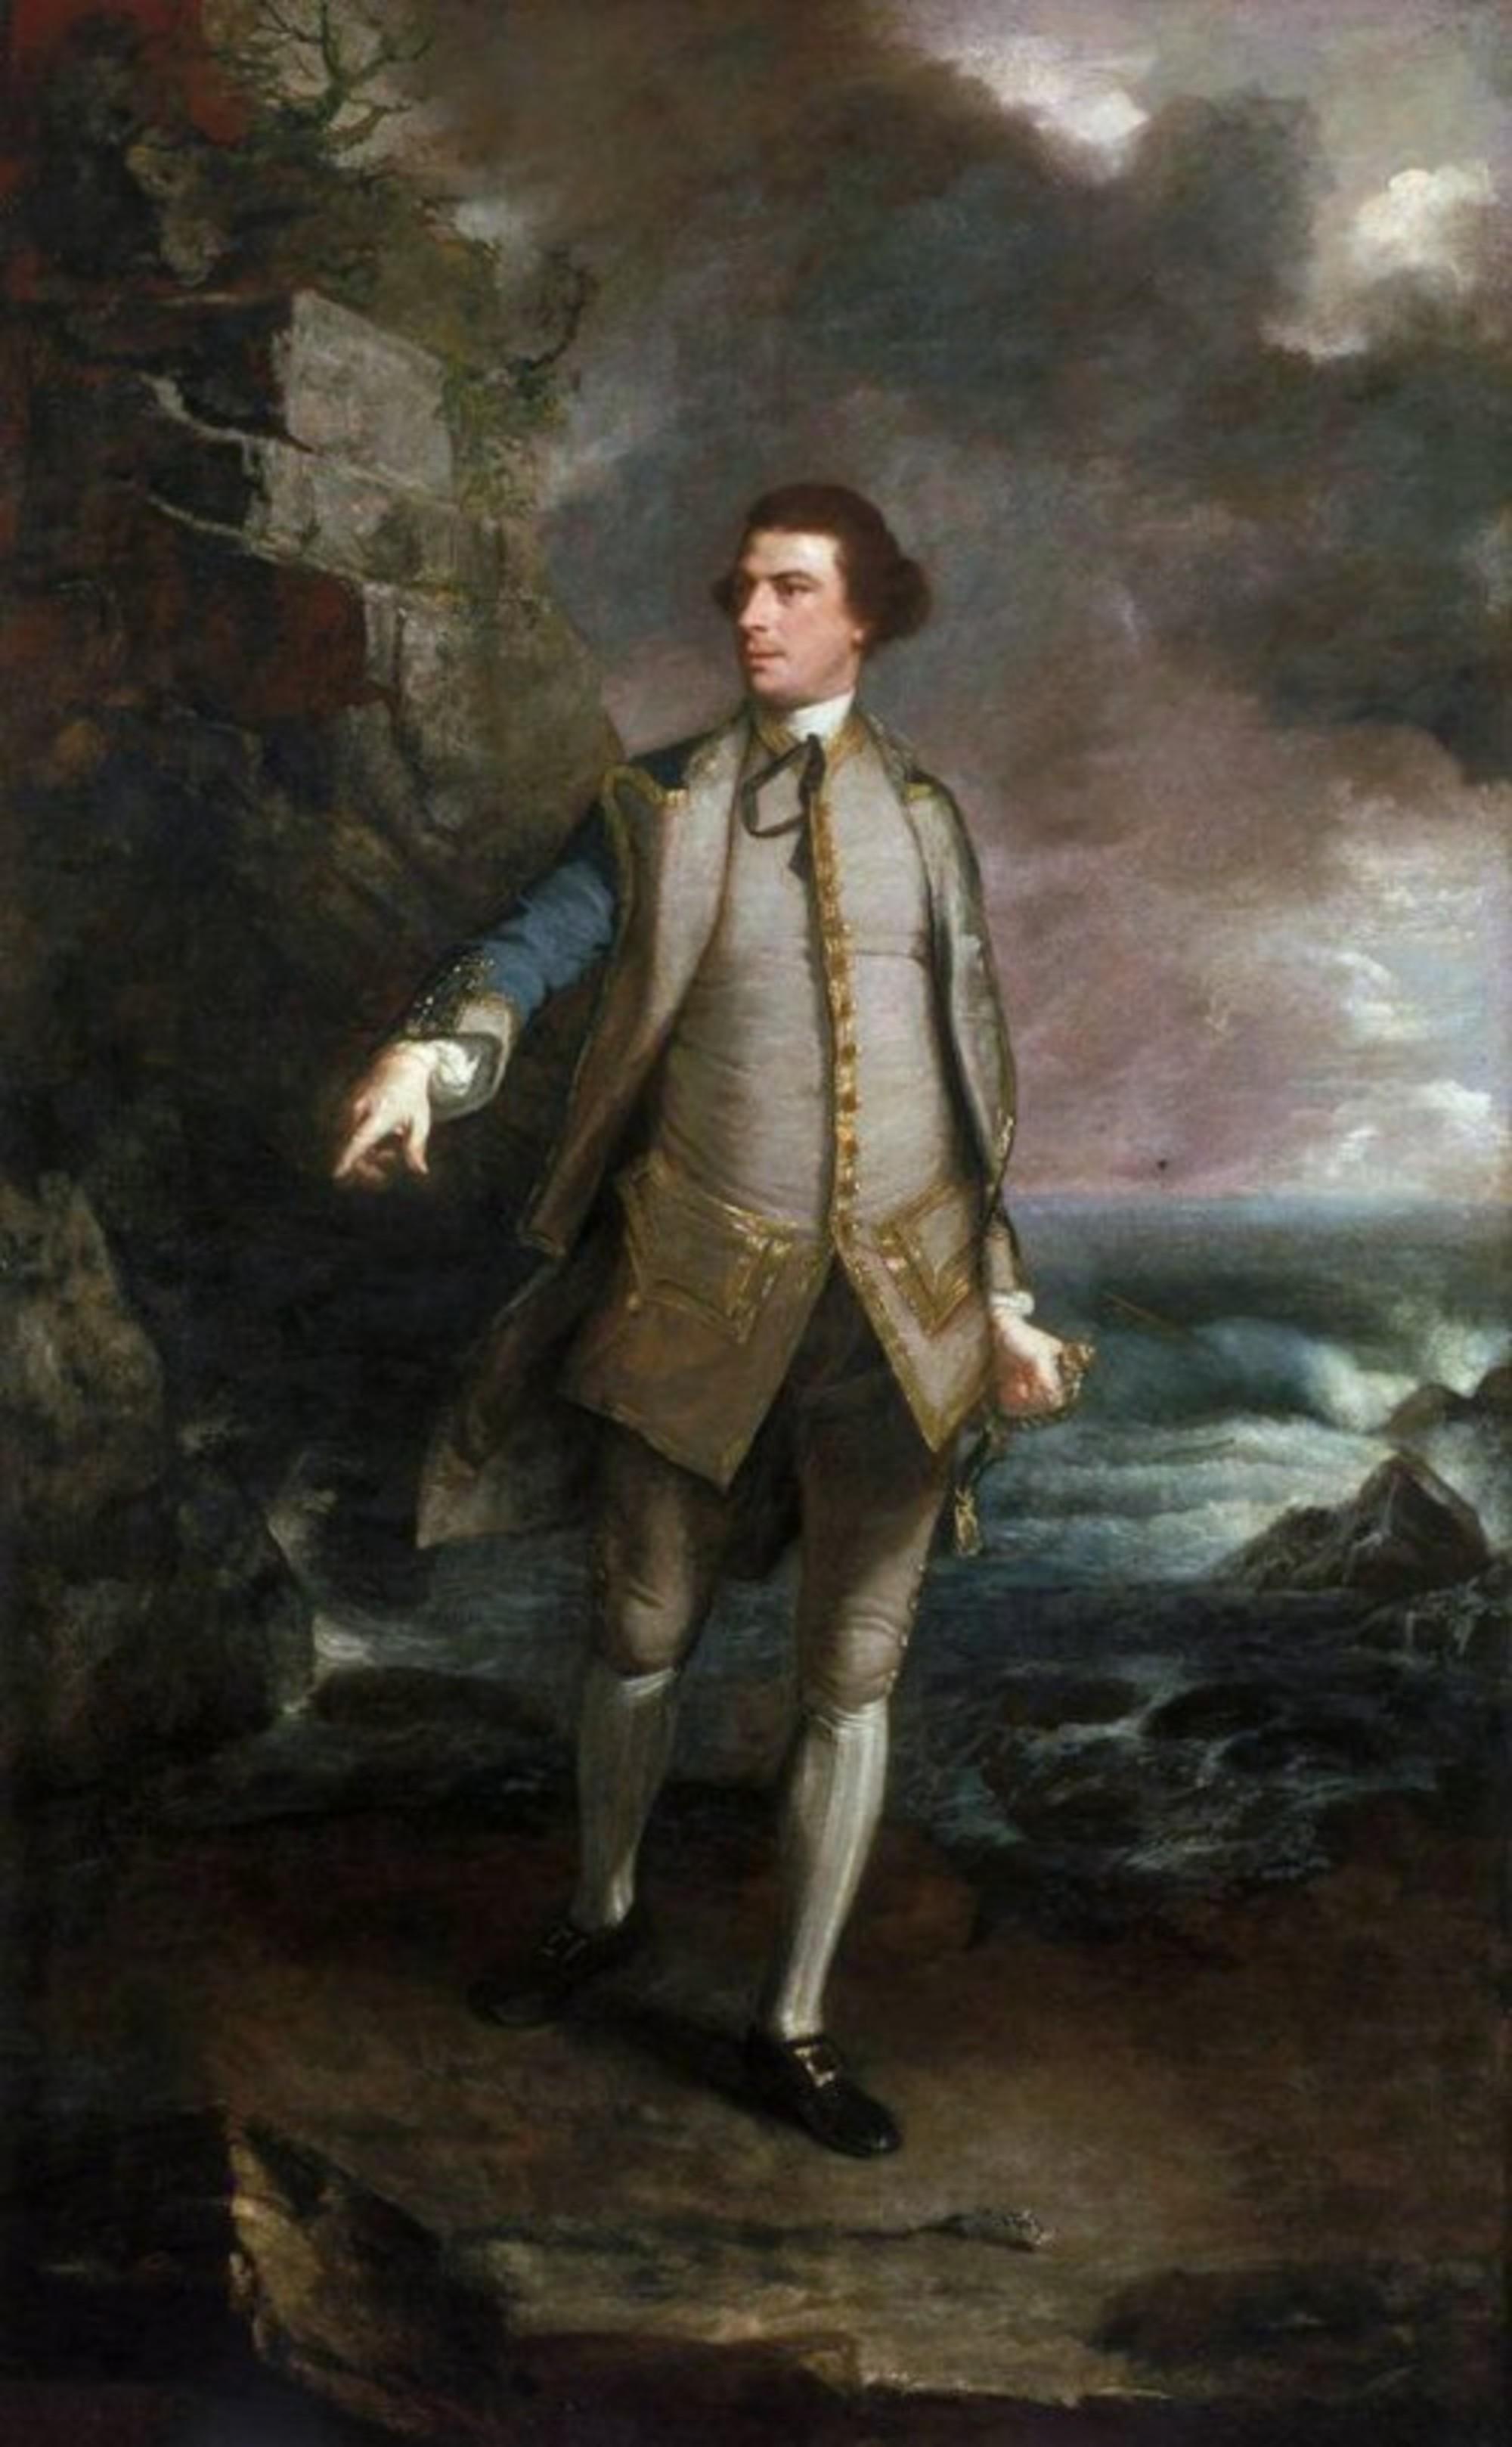 Captain_the_Honourable_Augustus_Keppel_1725-86_by_Sir_Joshua_Reynolds.jpg